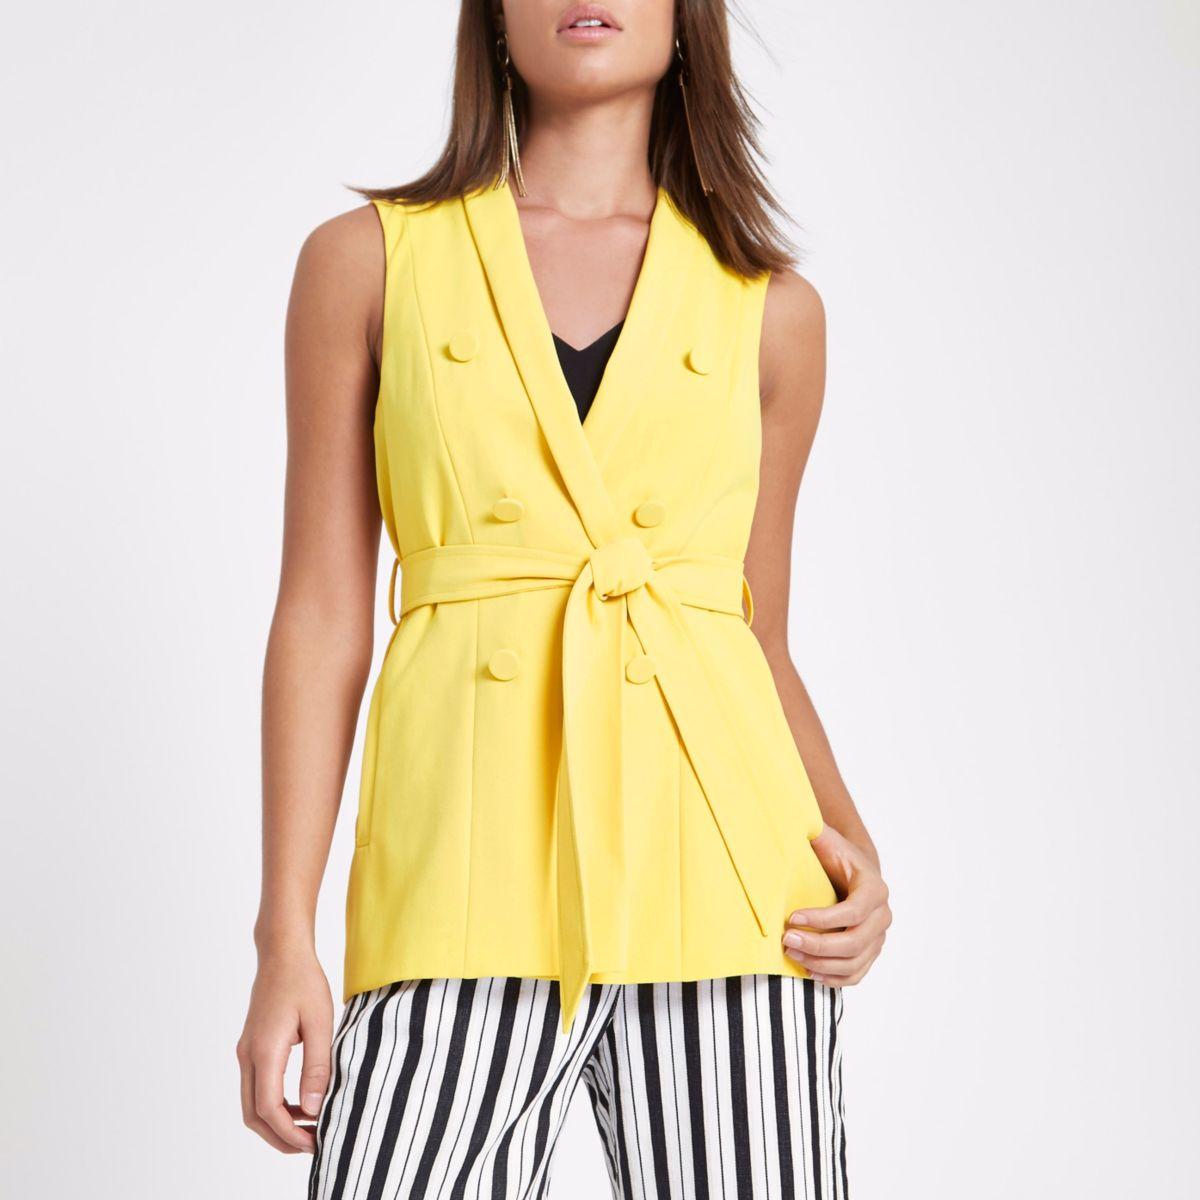 Yellow sleeveless double breasted jacket